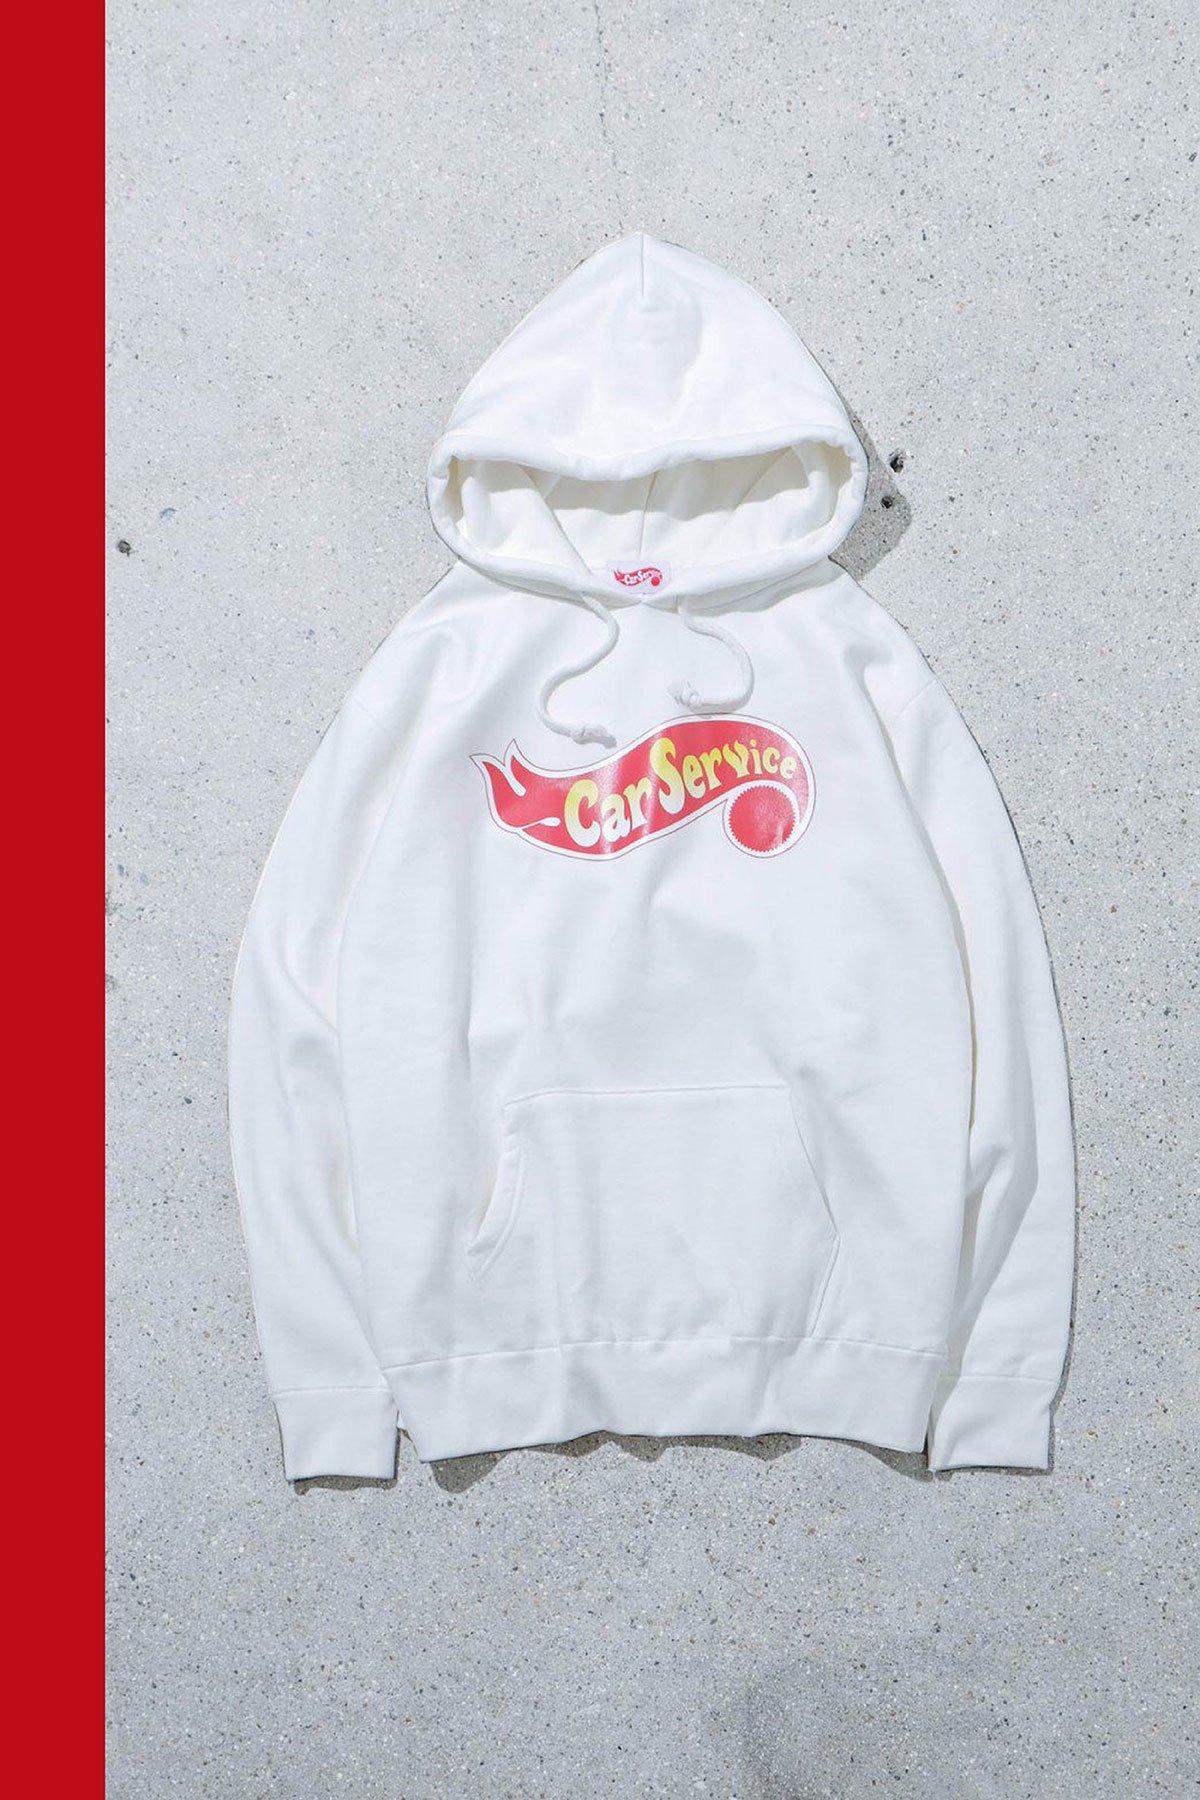 Carservice / Logo Hoodie WHITE